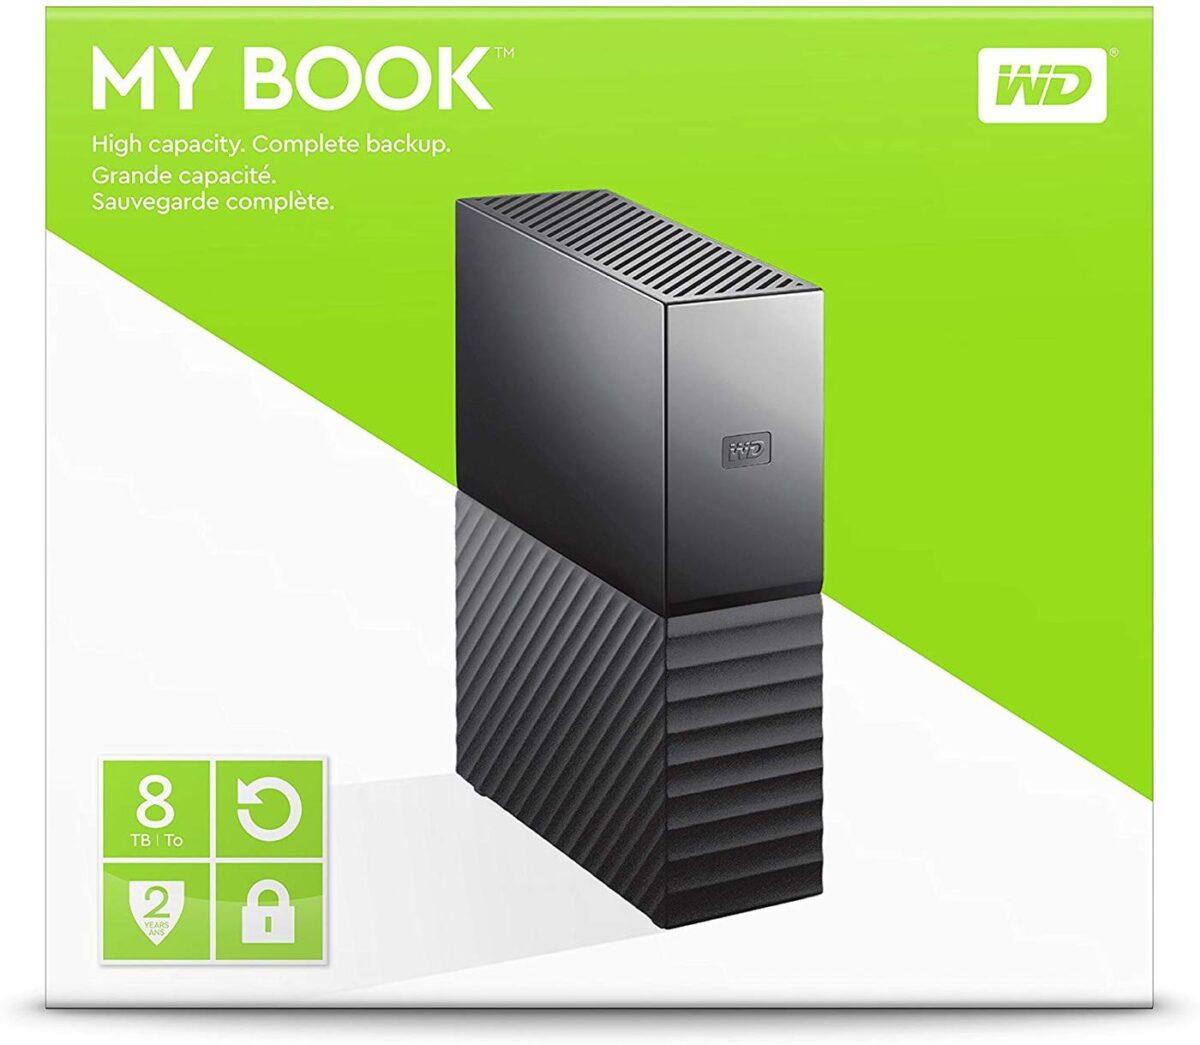 Western Digital My Book 8TB External Hard Drive